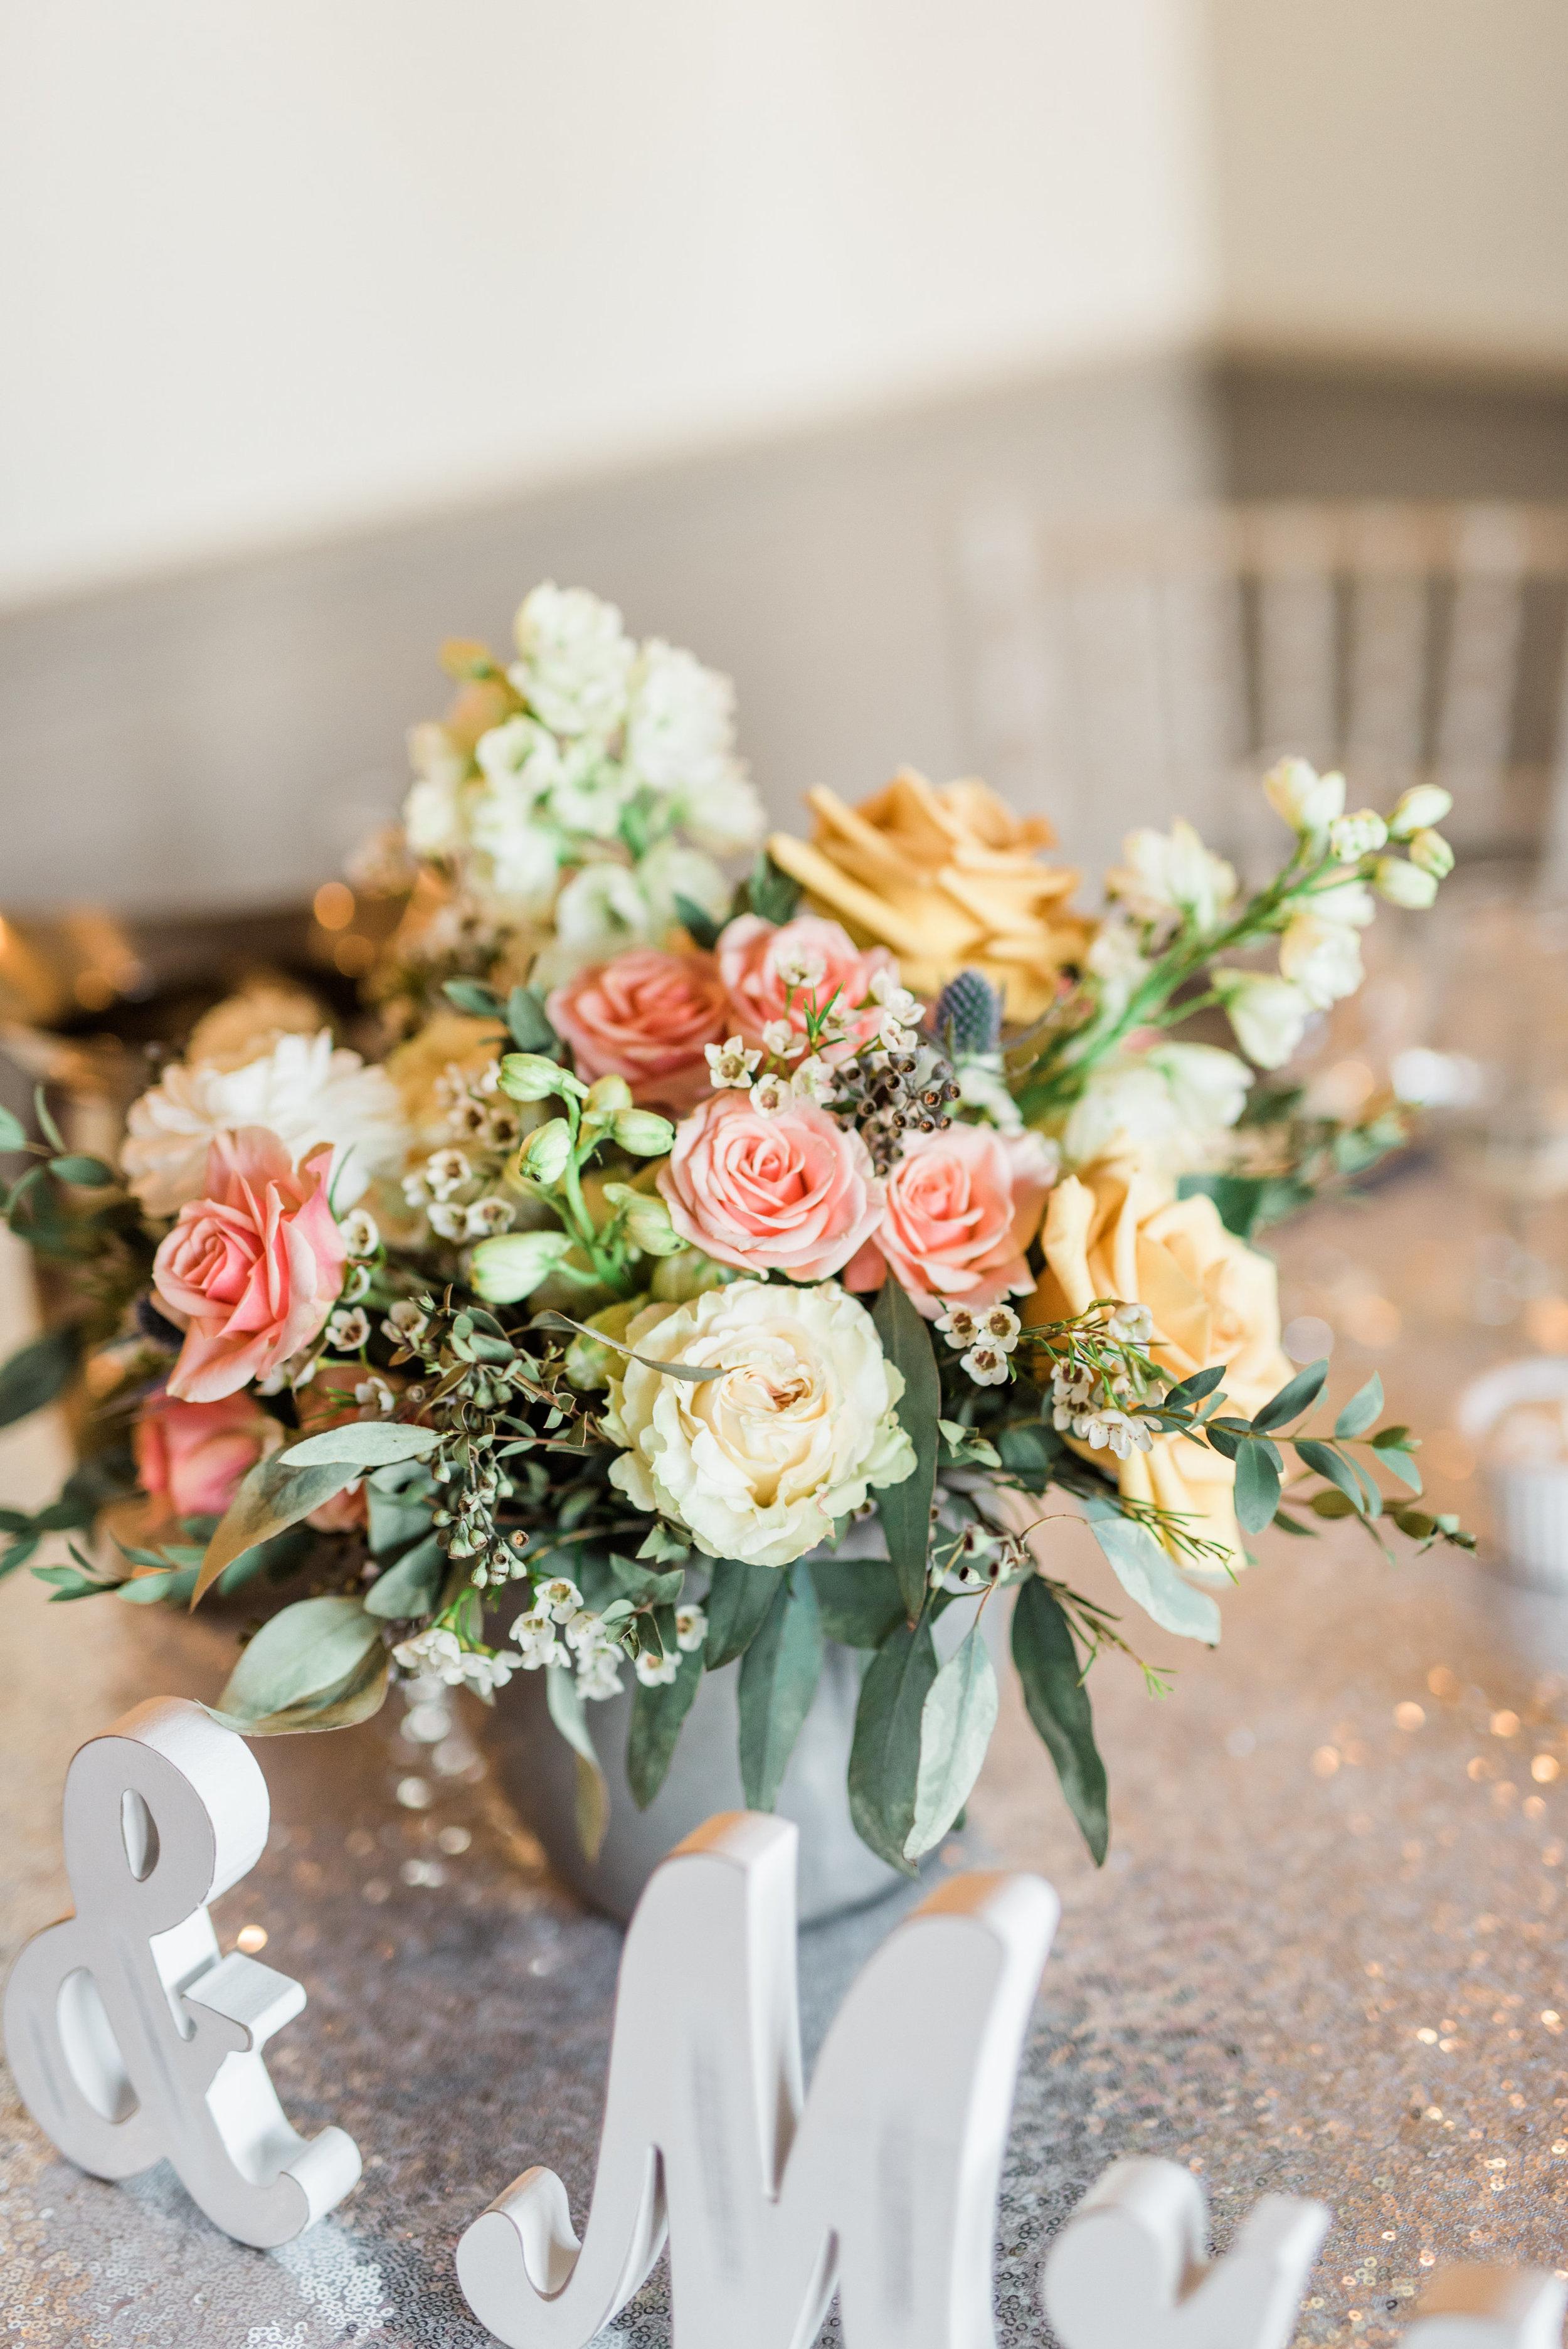 Boho Sedona Wedding - Centerpiece